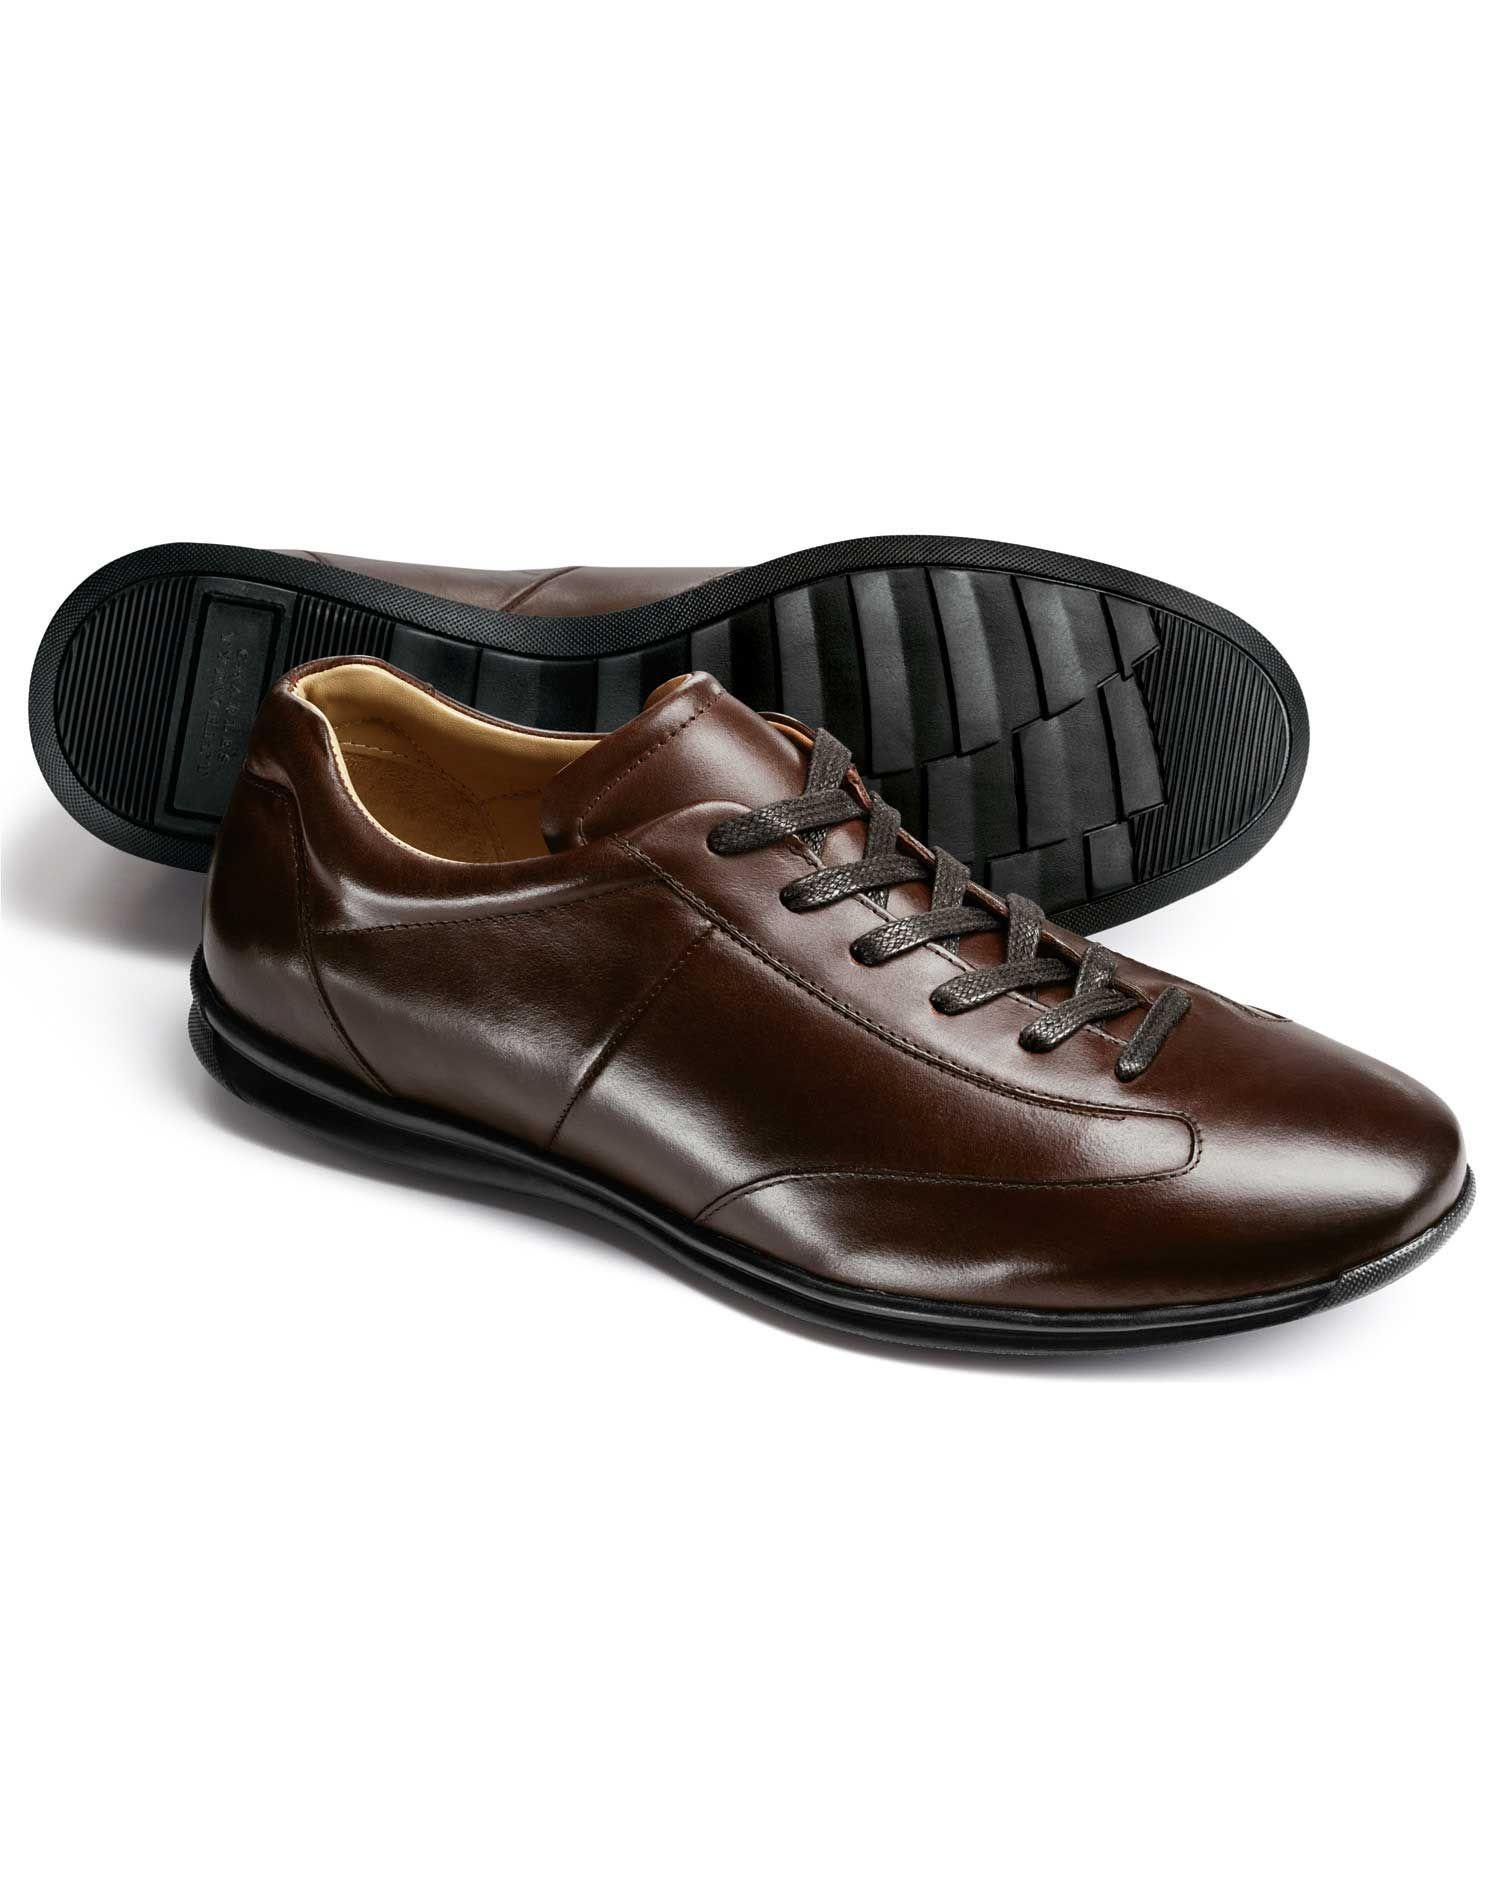 Brown Lansdowne trainers | Business casual sneakers, Work